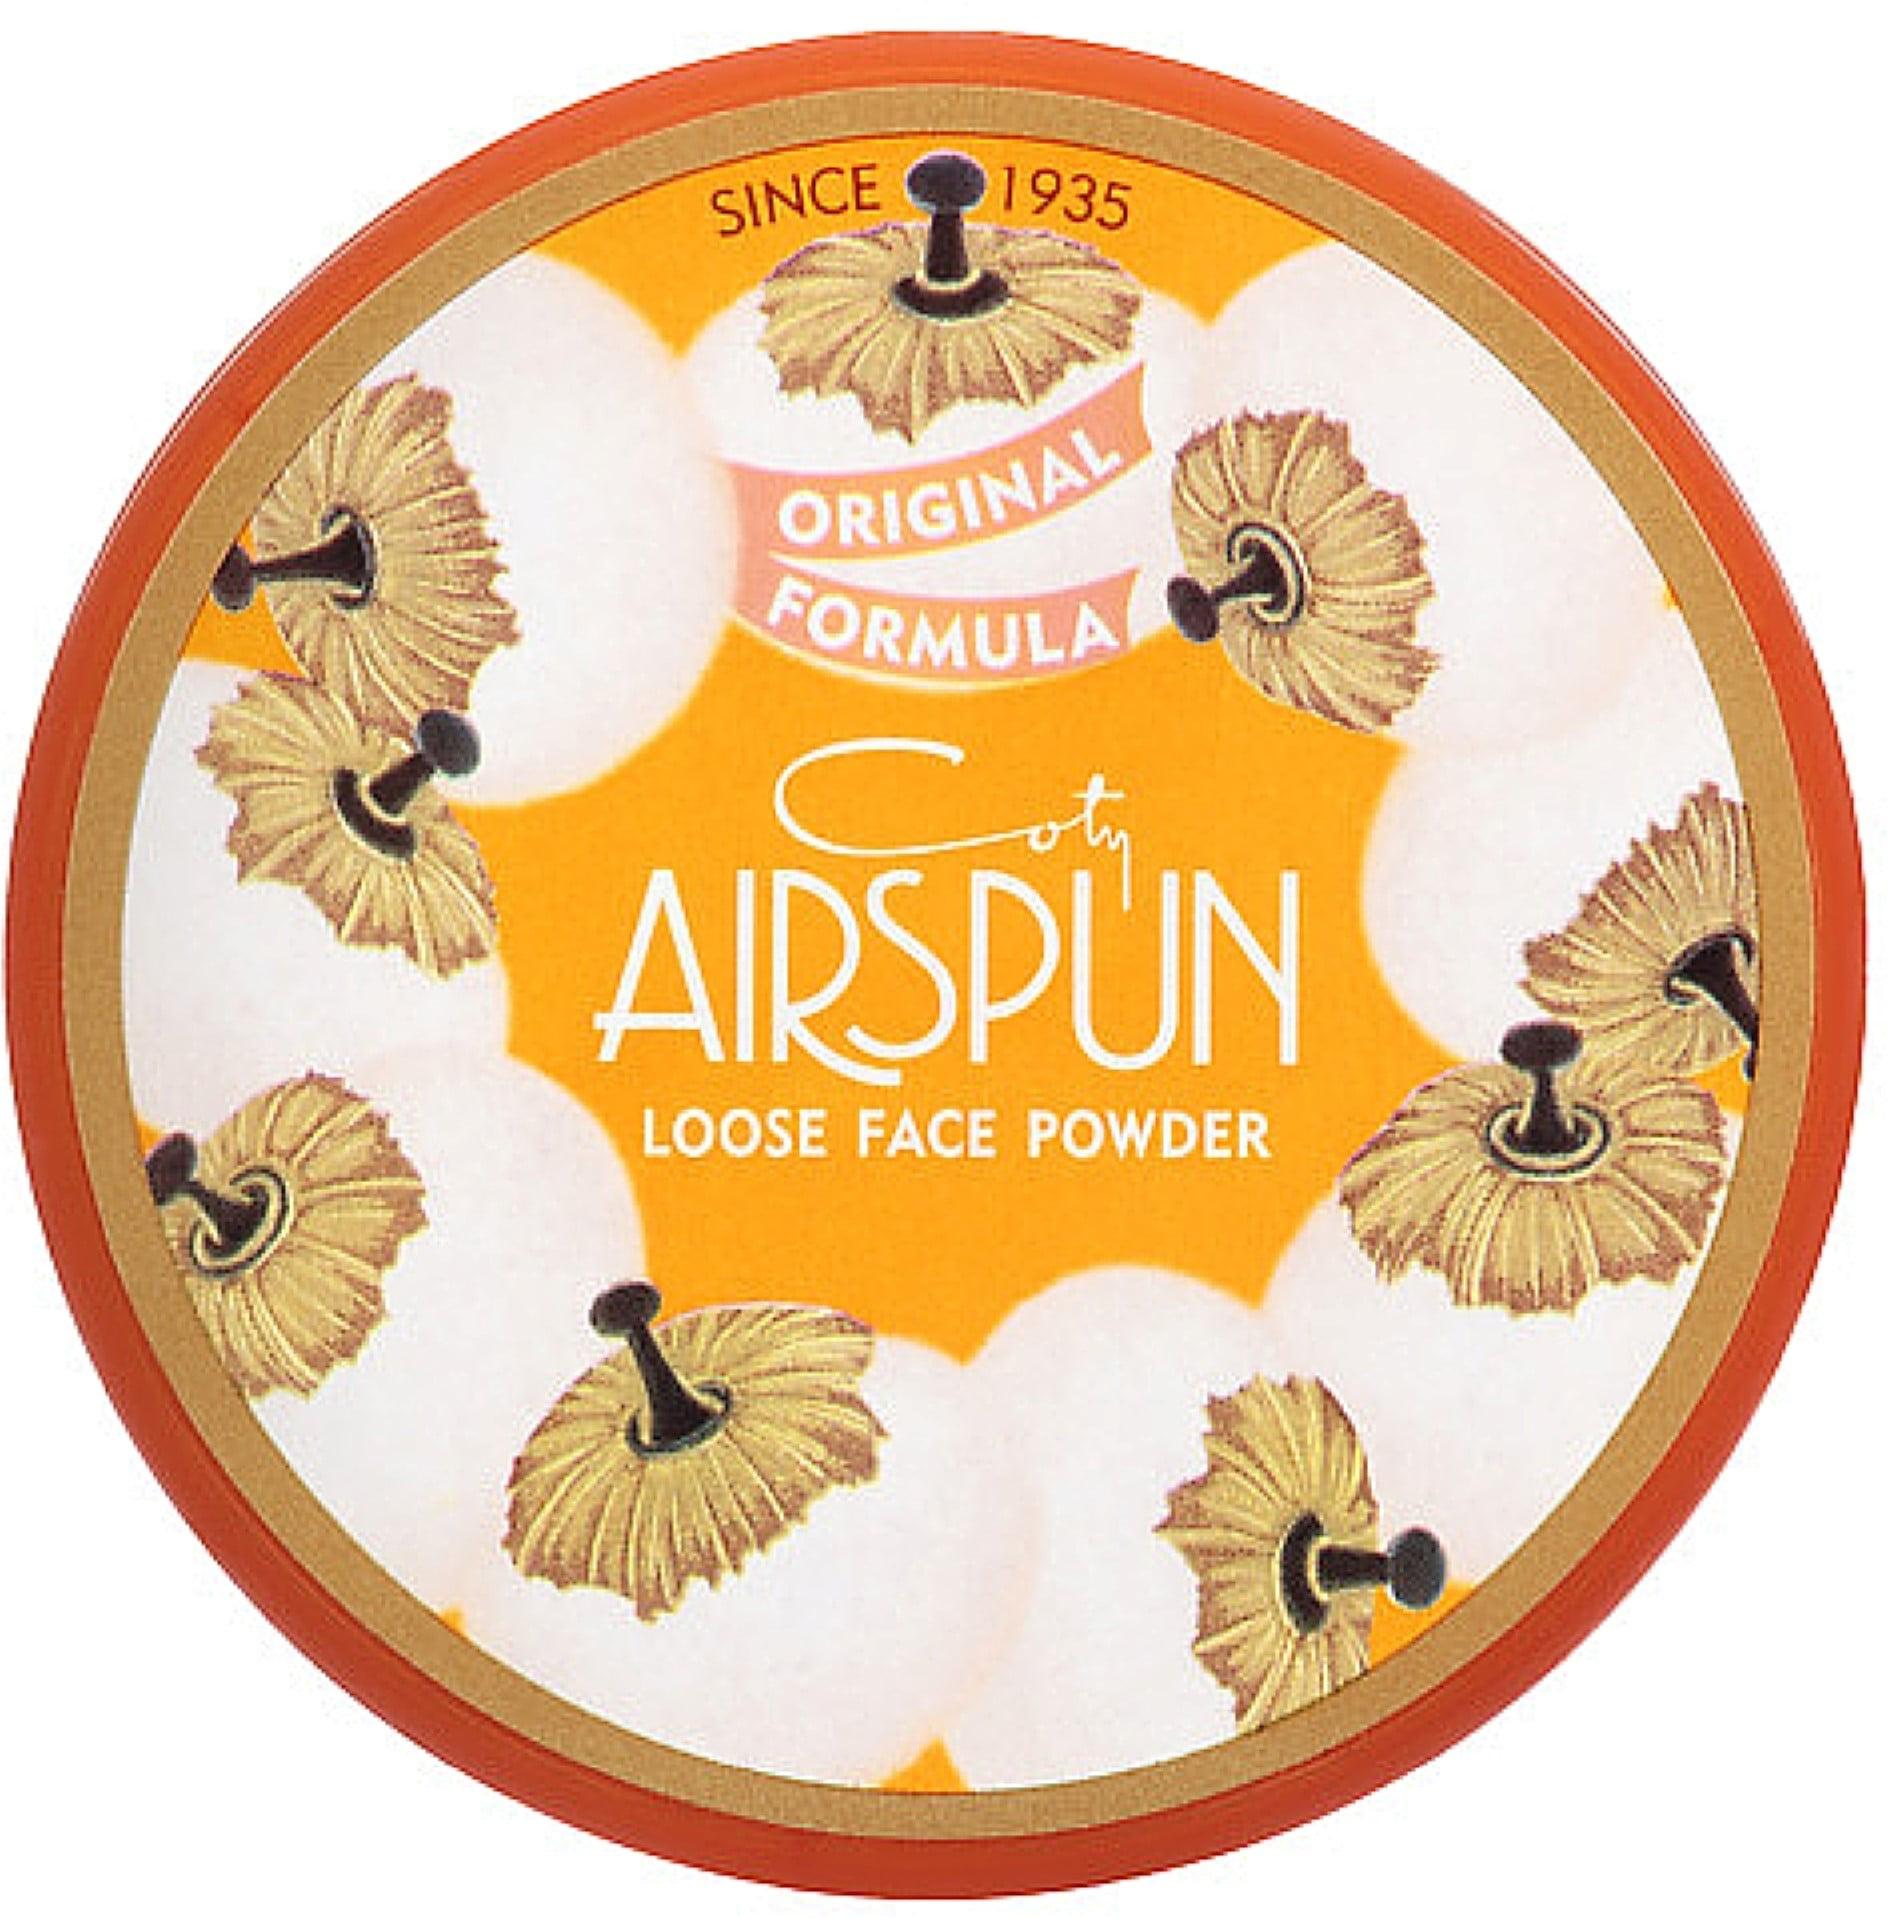 Coty Airspun Loose Face Powder, Honey Beige 2.30 oz (Pack of 4)